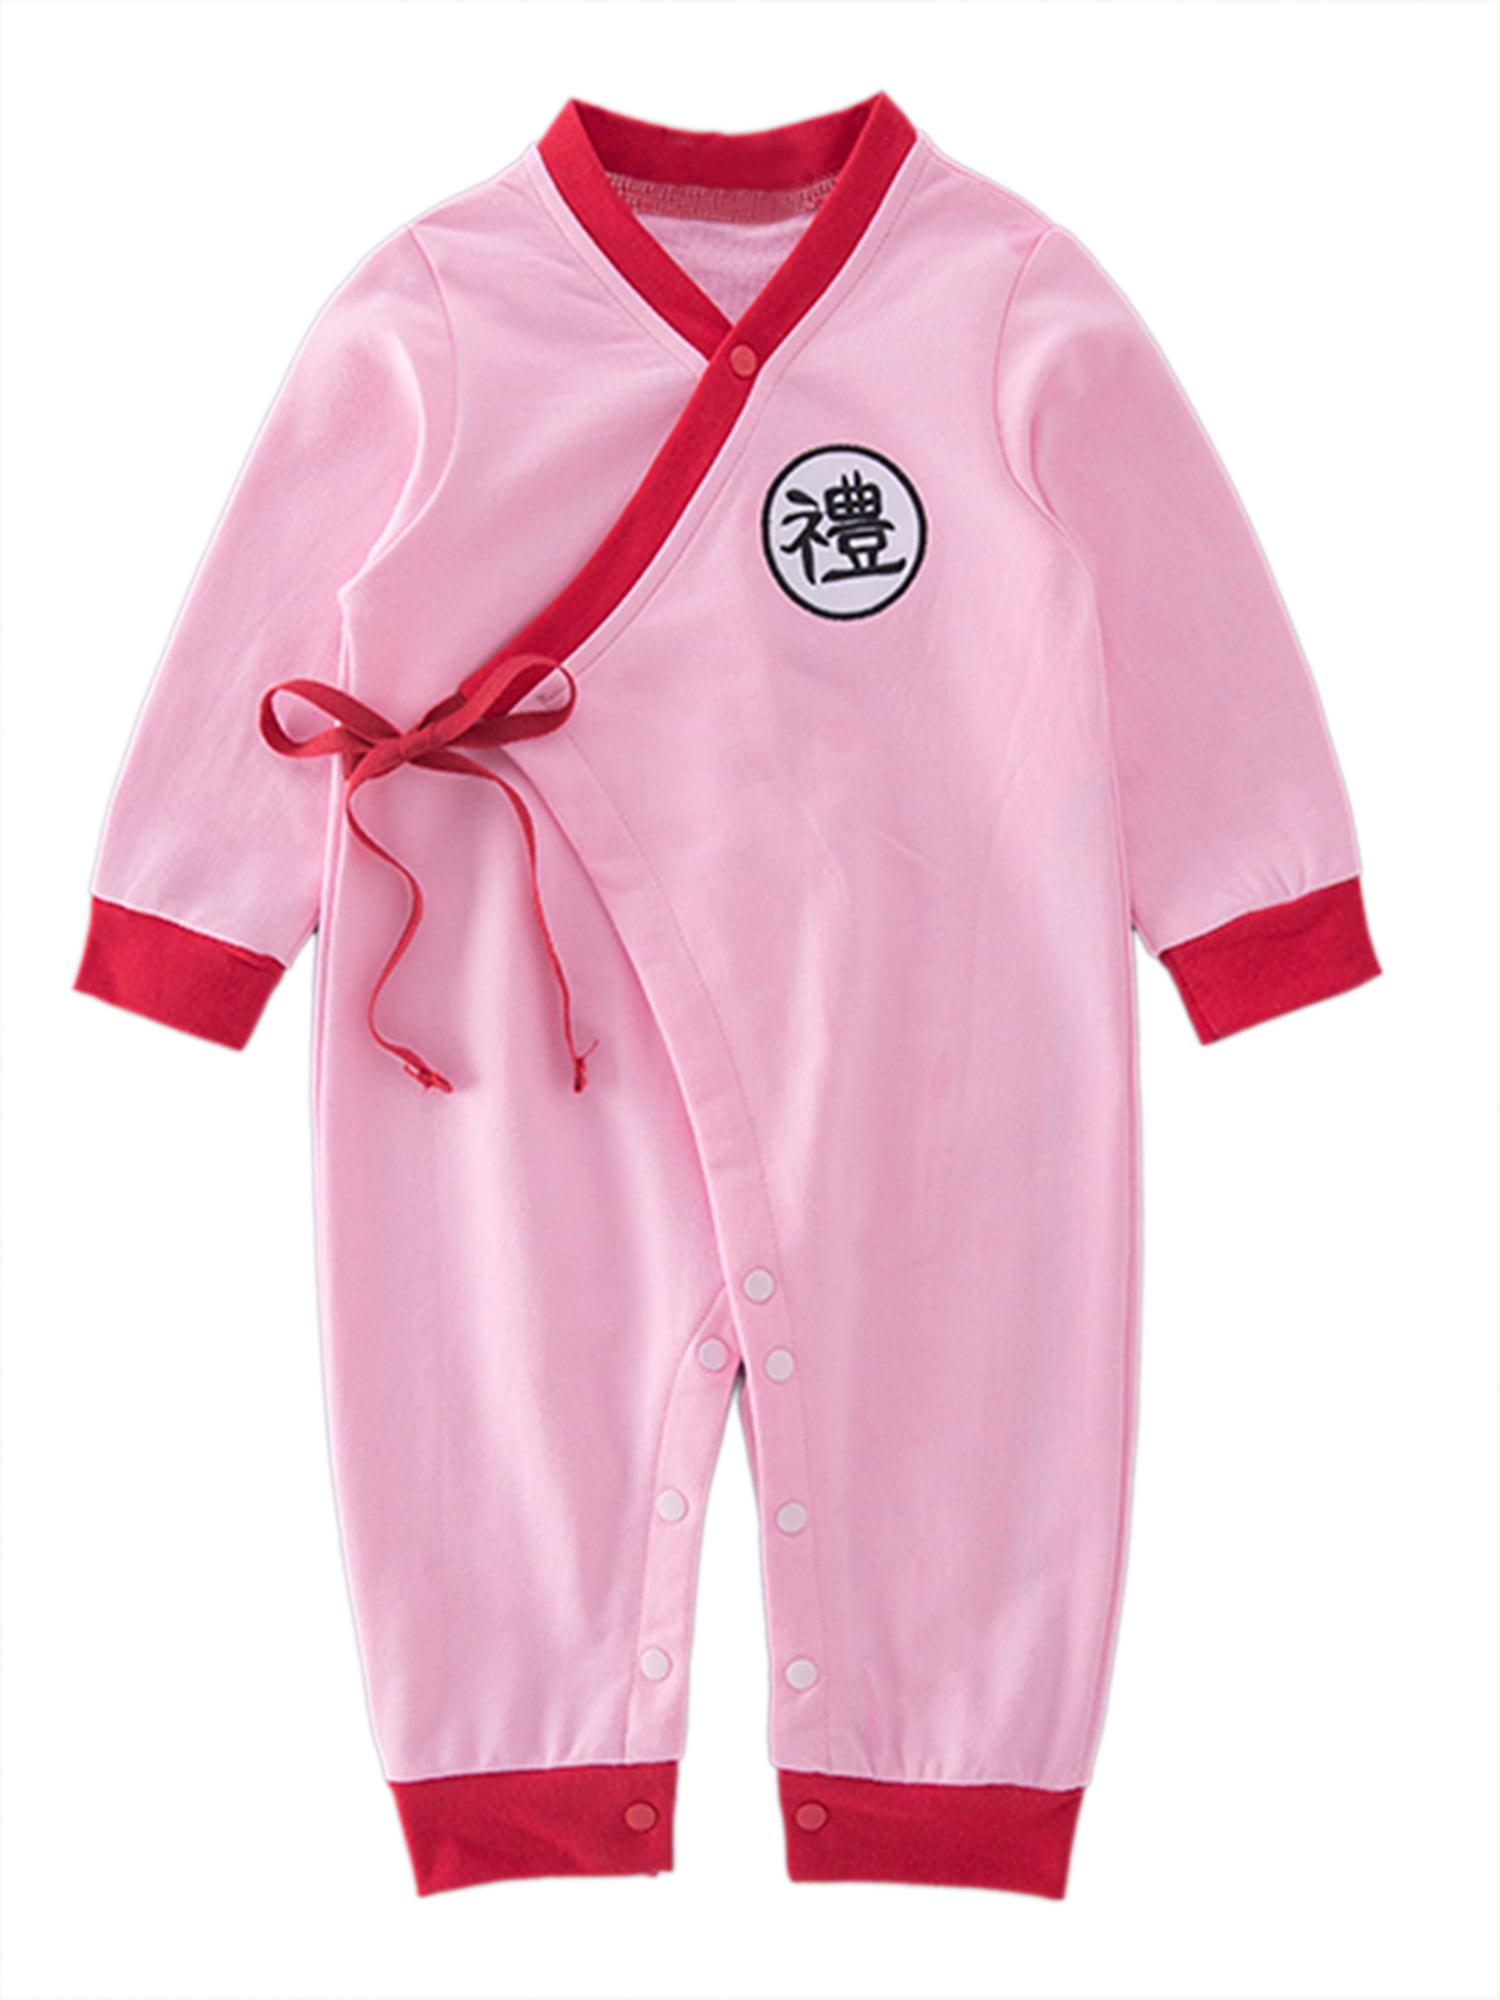 stylesilove Baby Toddler Boys Asian Inspired Long Sleeves Costume Romper